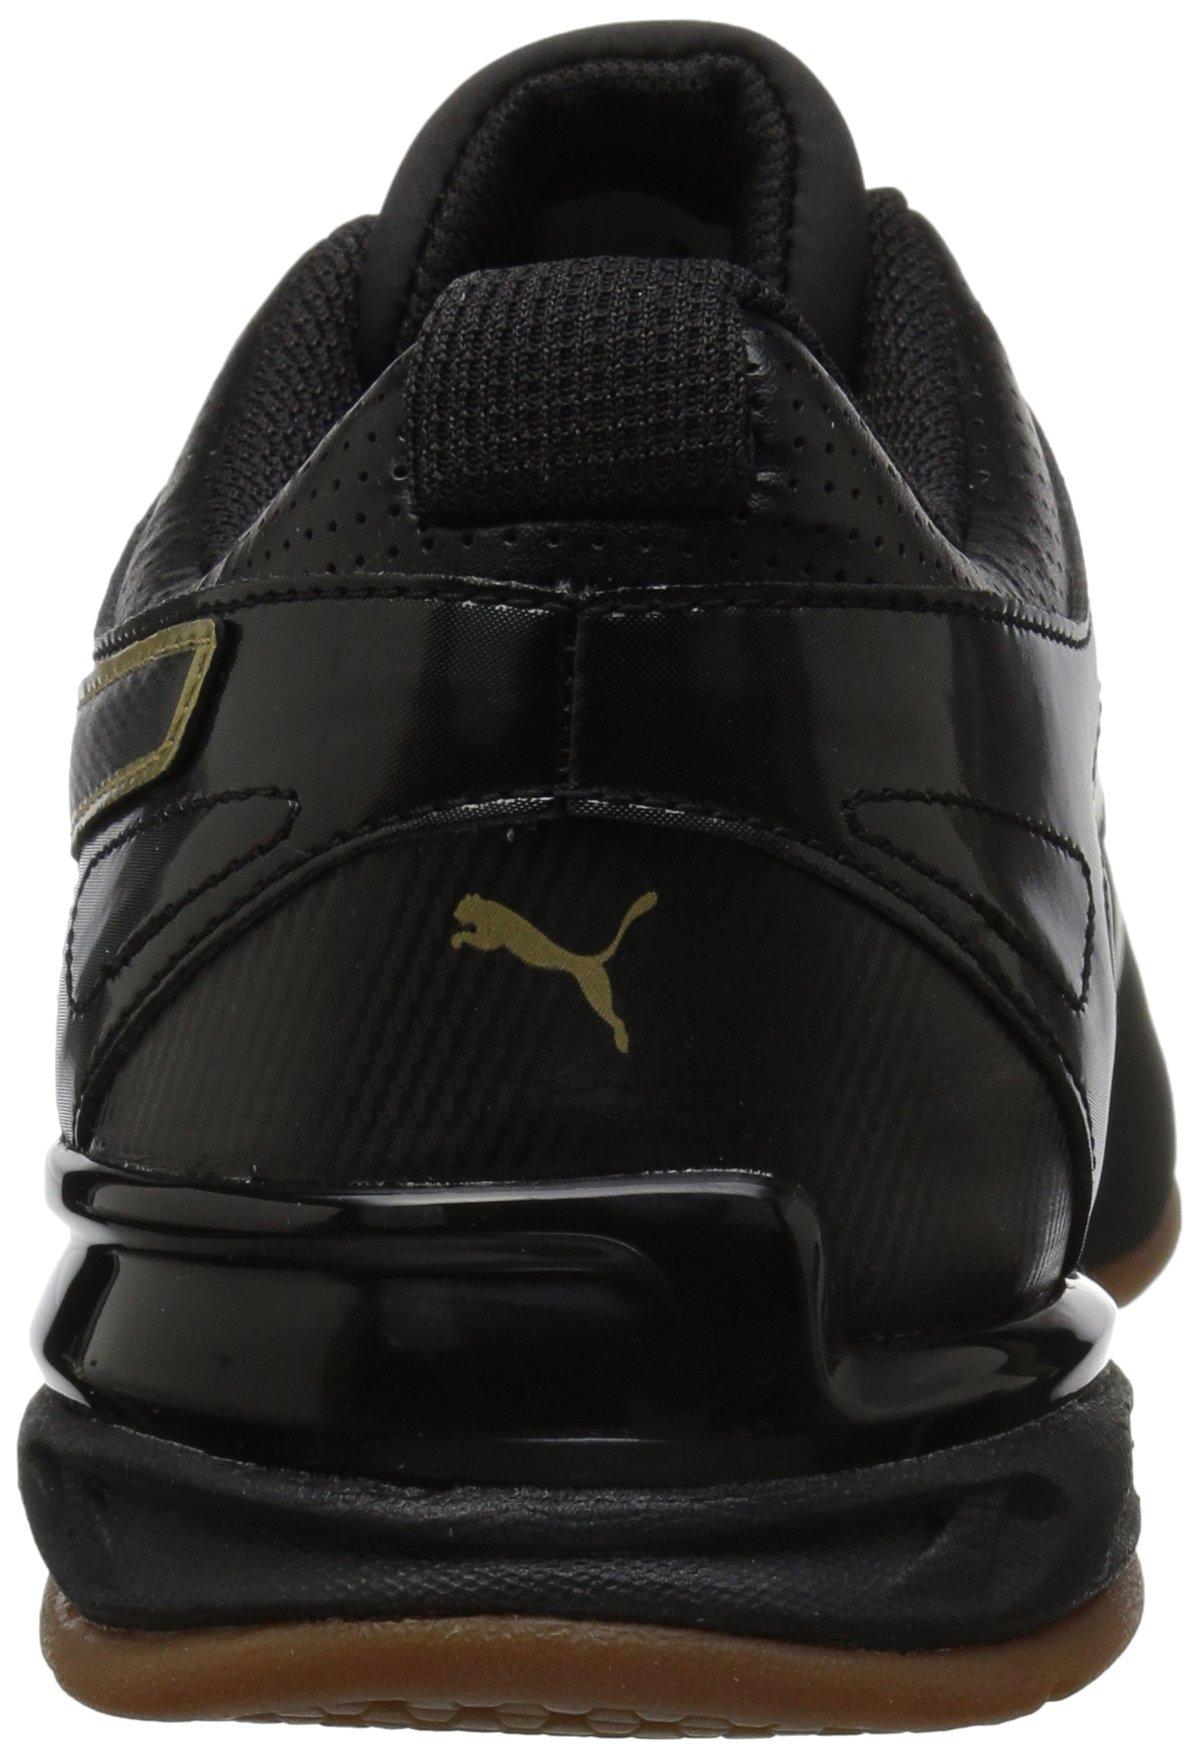 924416e3de98d8 PUMA Women s Tazon 6 WN s Fm Cross-Trainer Shoe   Fitness   Cross-Training    Clothing